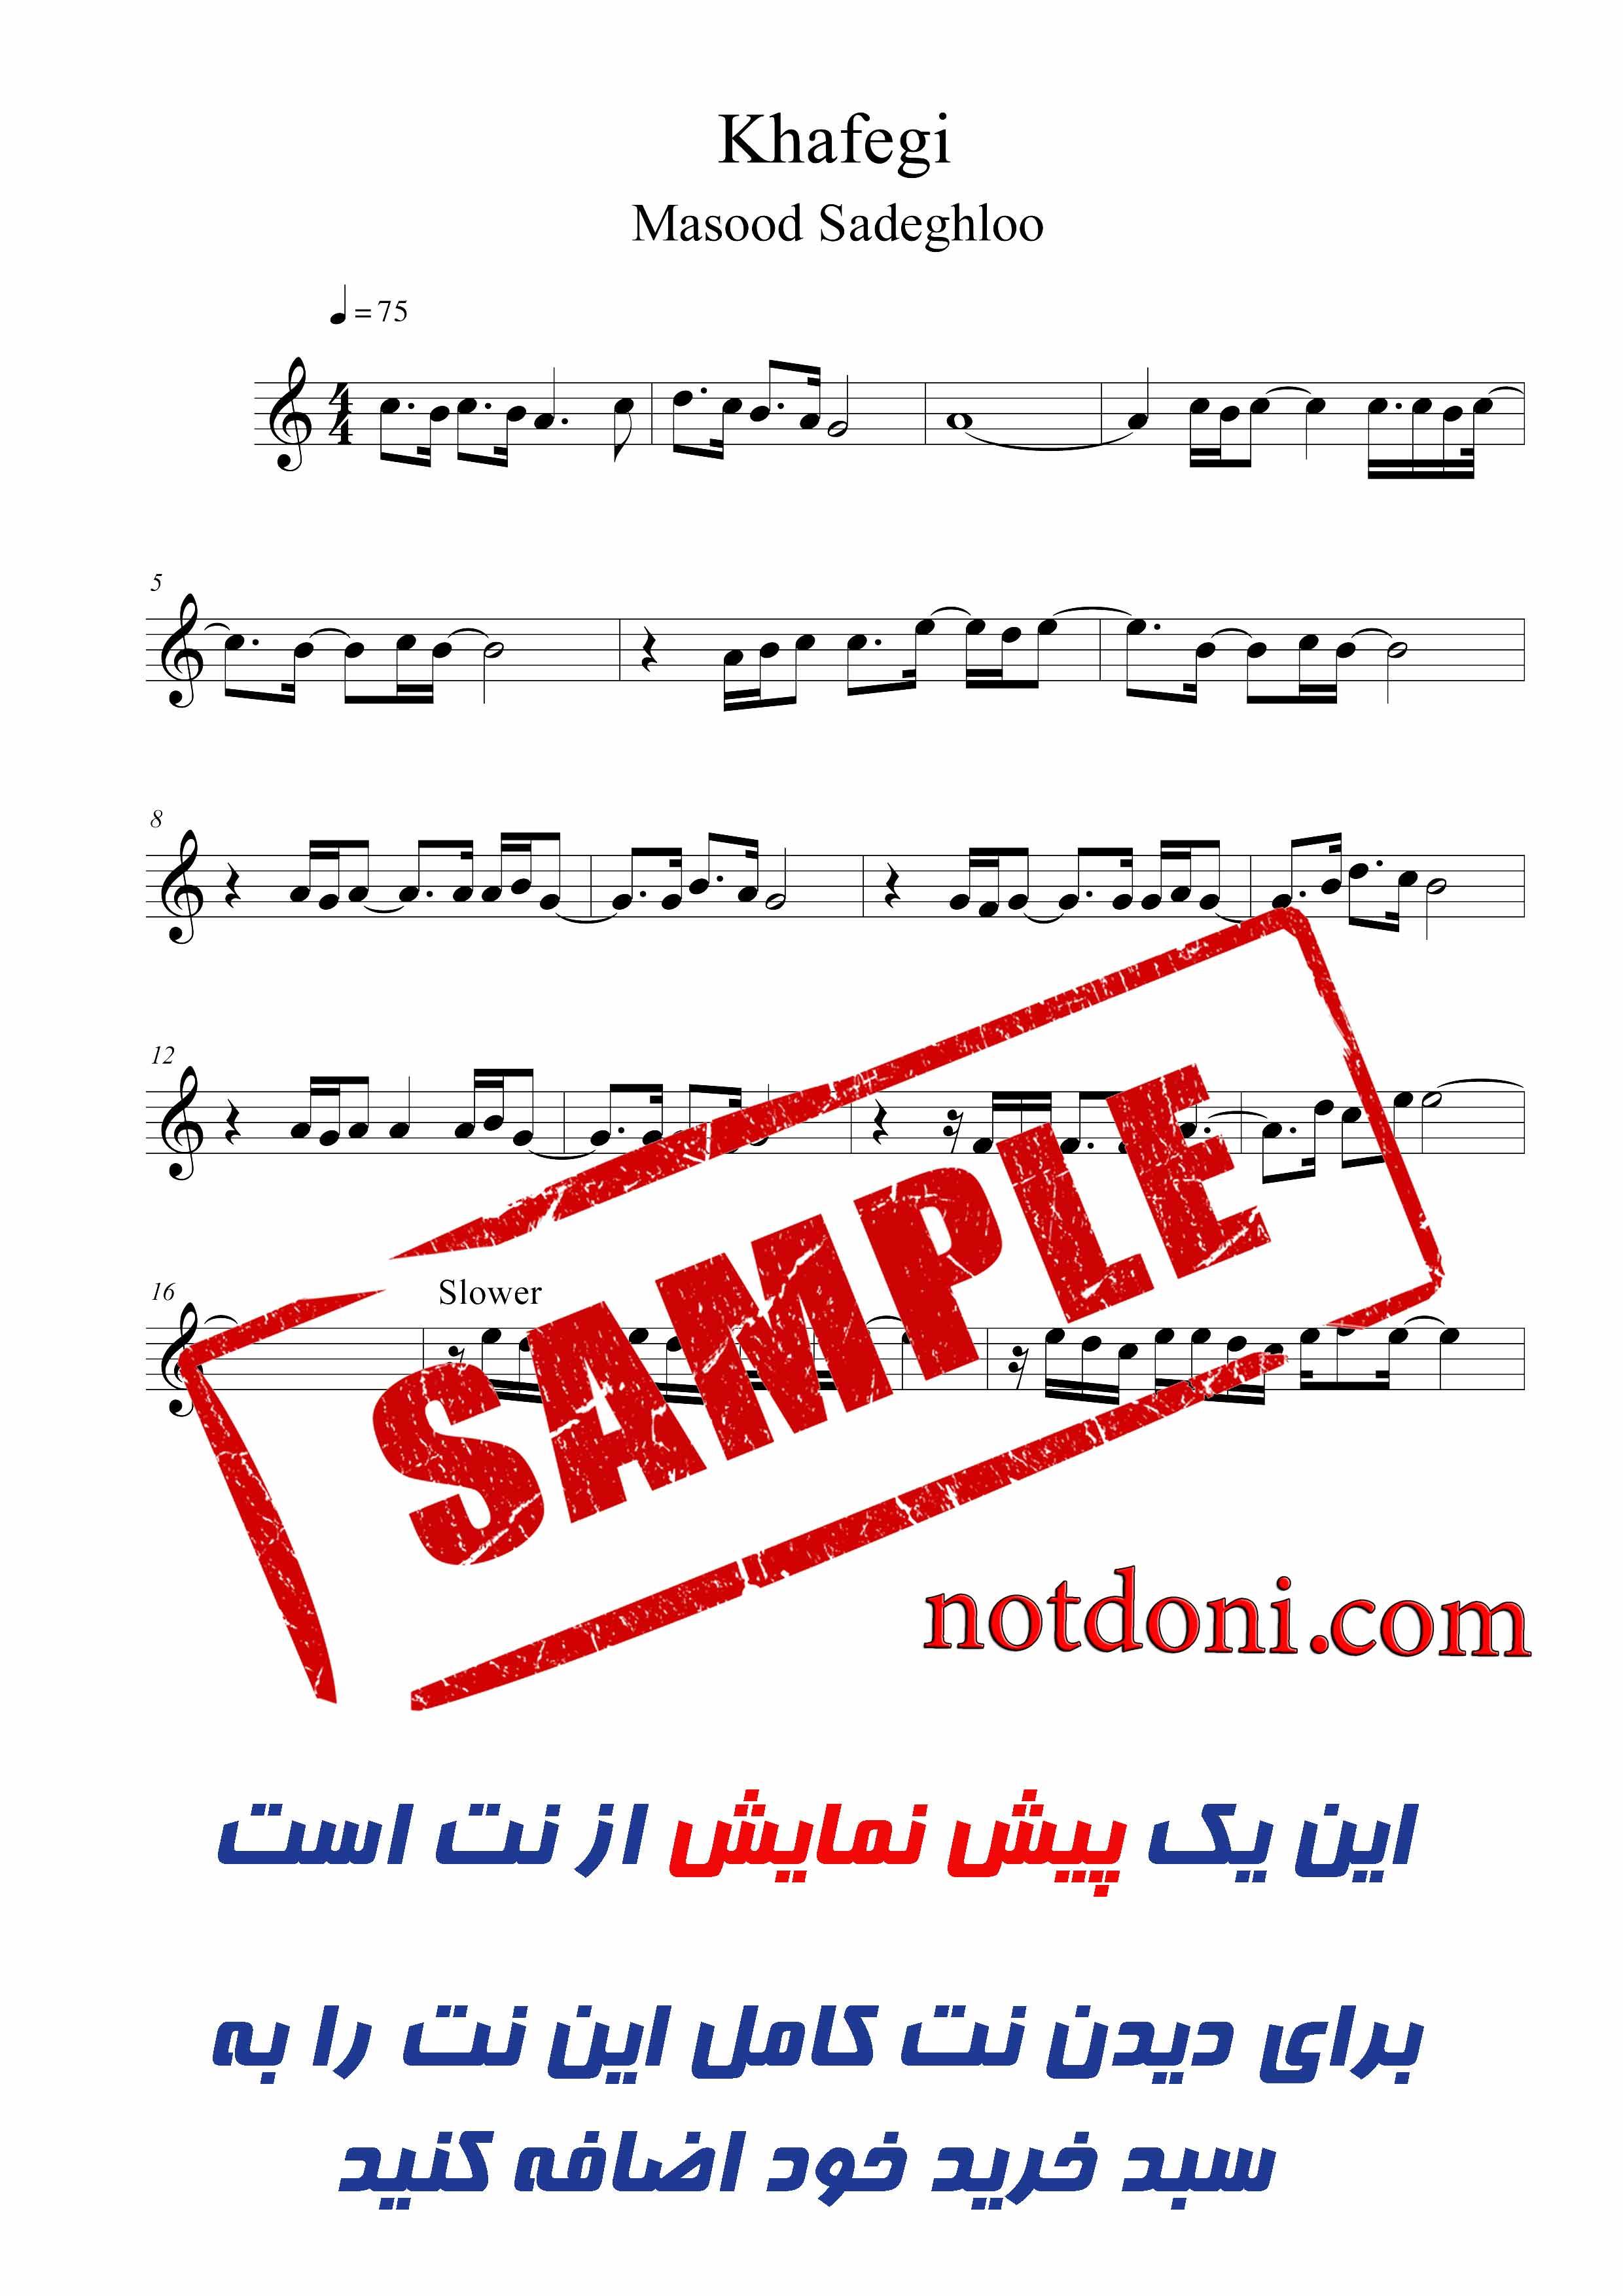 5a5d28ca-7017-4503-8fe5-595380e3181f_دموی-نت-آهنگ-خفگی-برای-ویولن.jpg